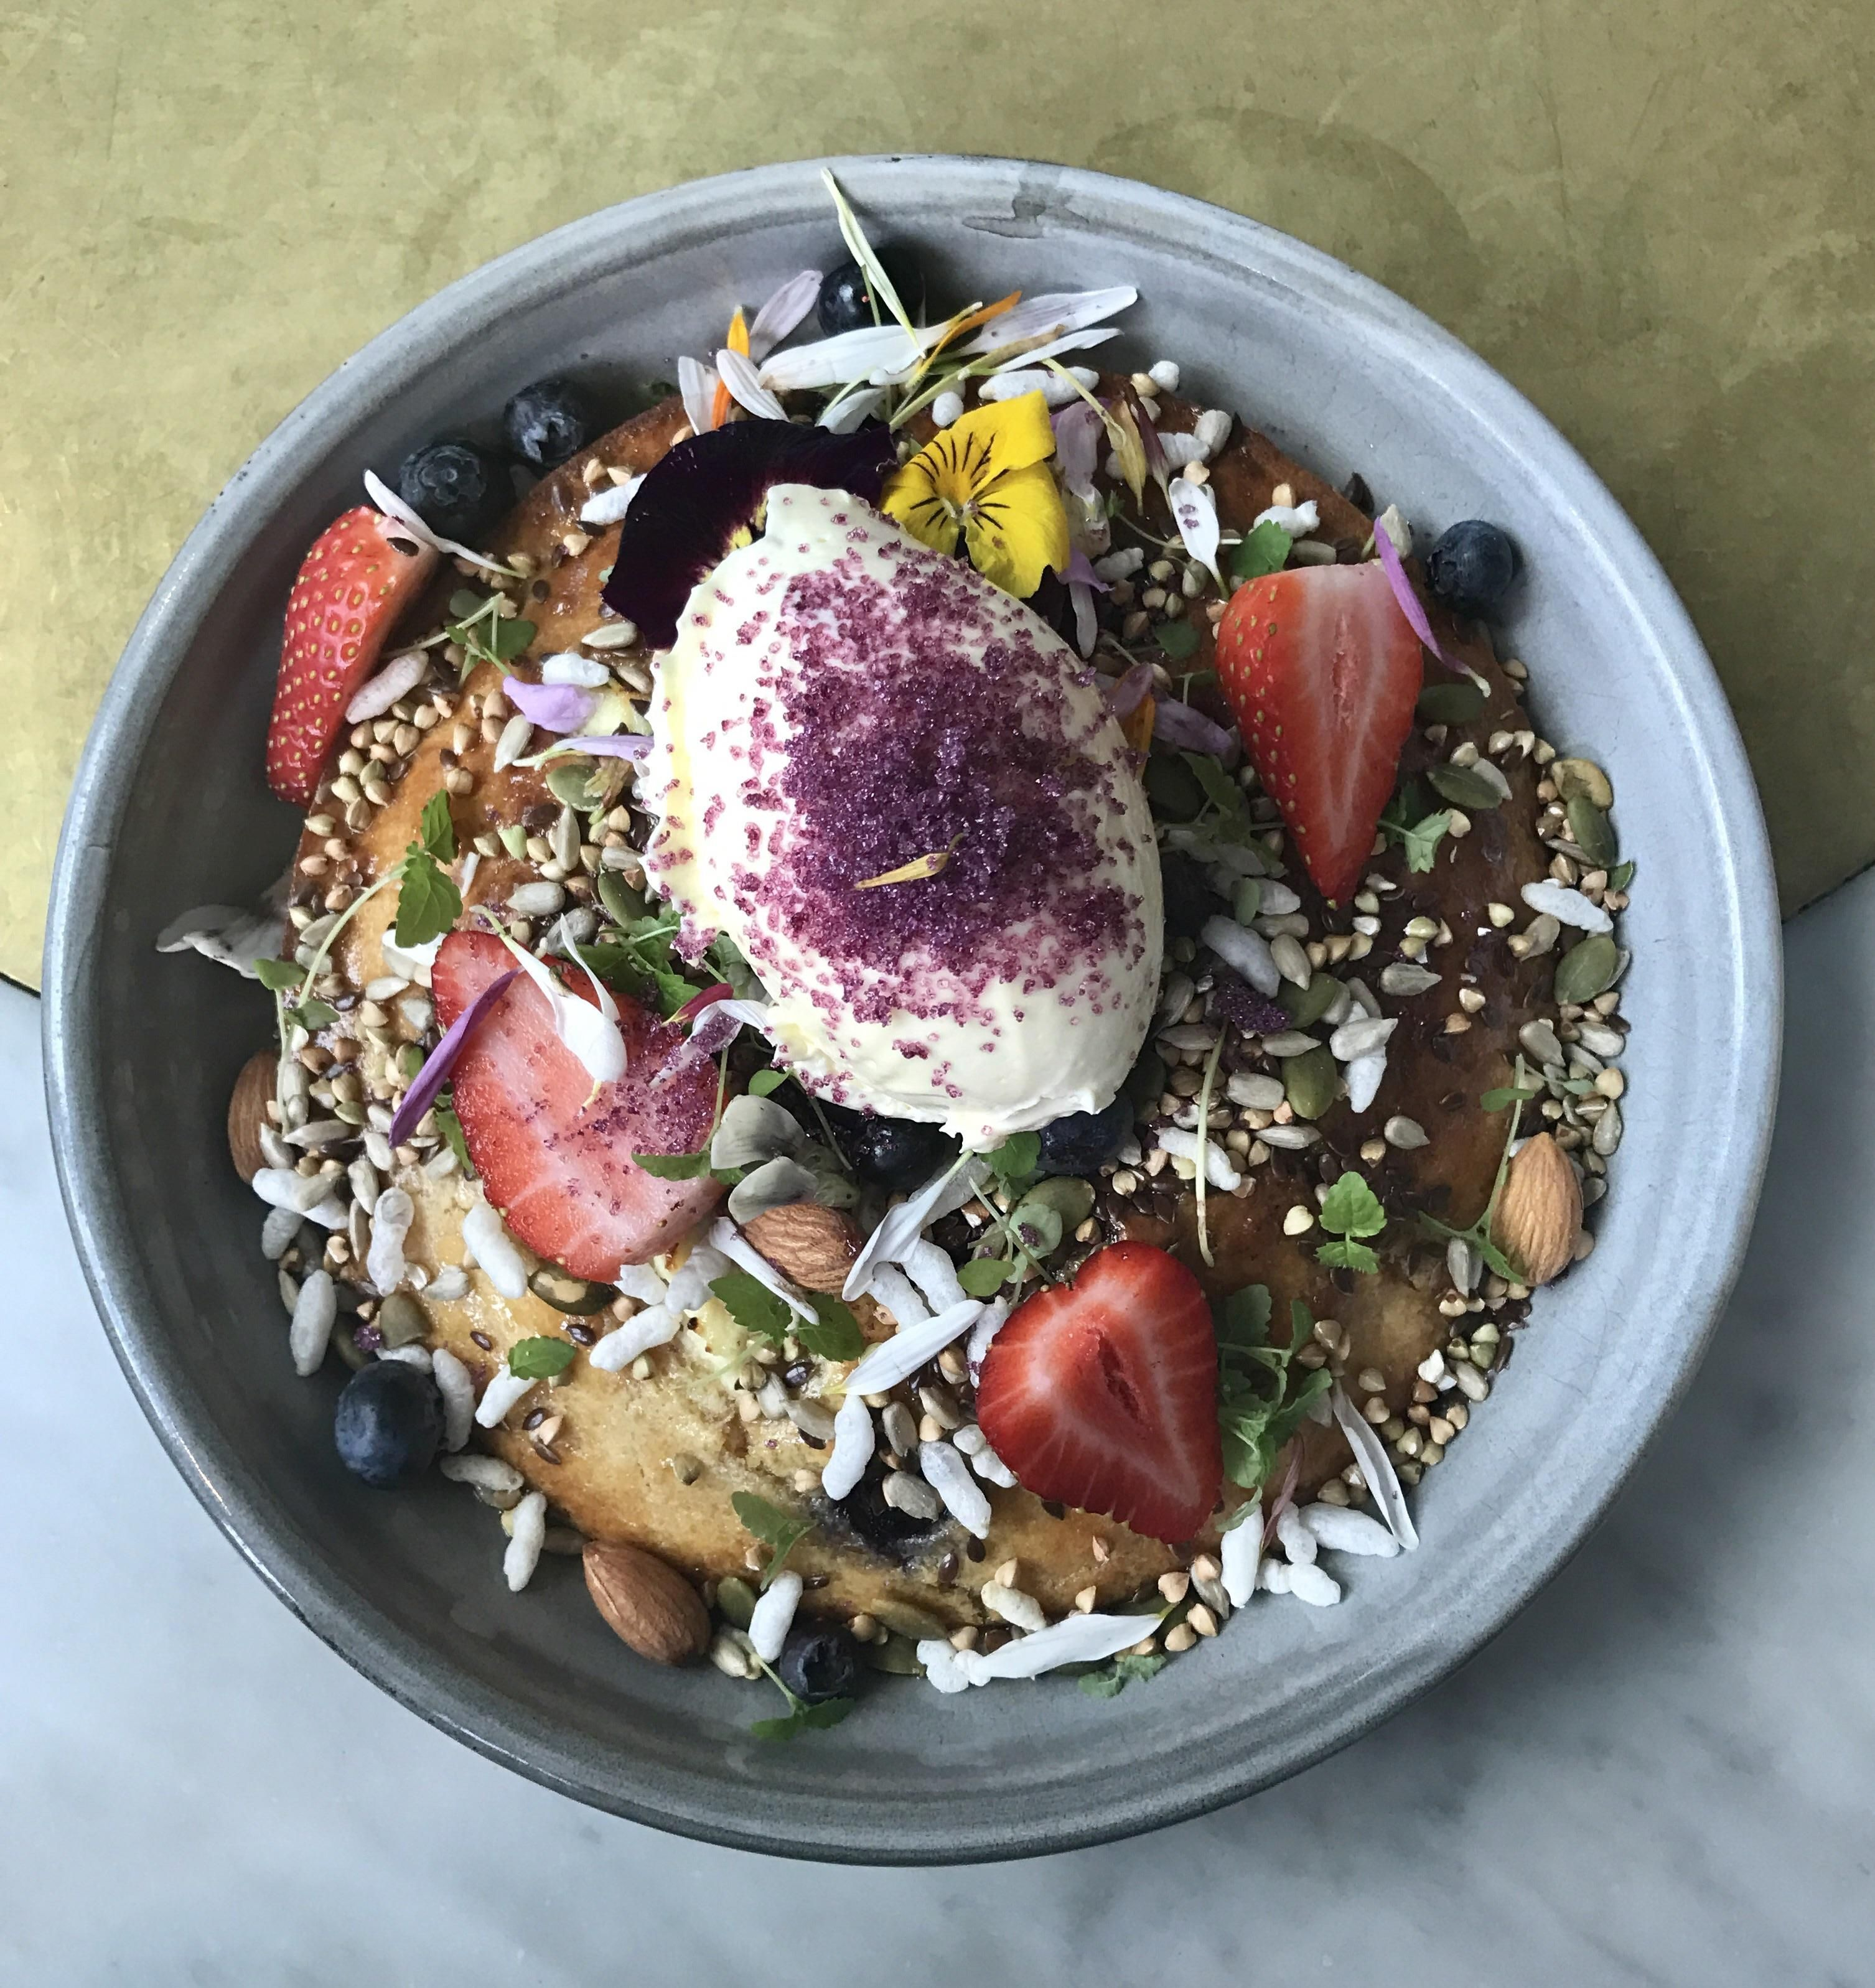 [I Ate] Lemon ricotta pancake! #recipes #food #cooking #delicious #foodie #foodrecipes #cook #recipe #health